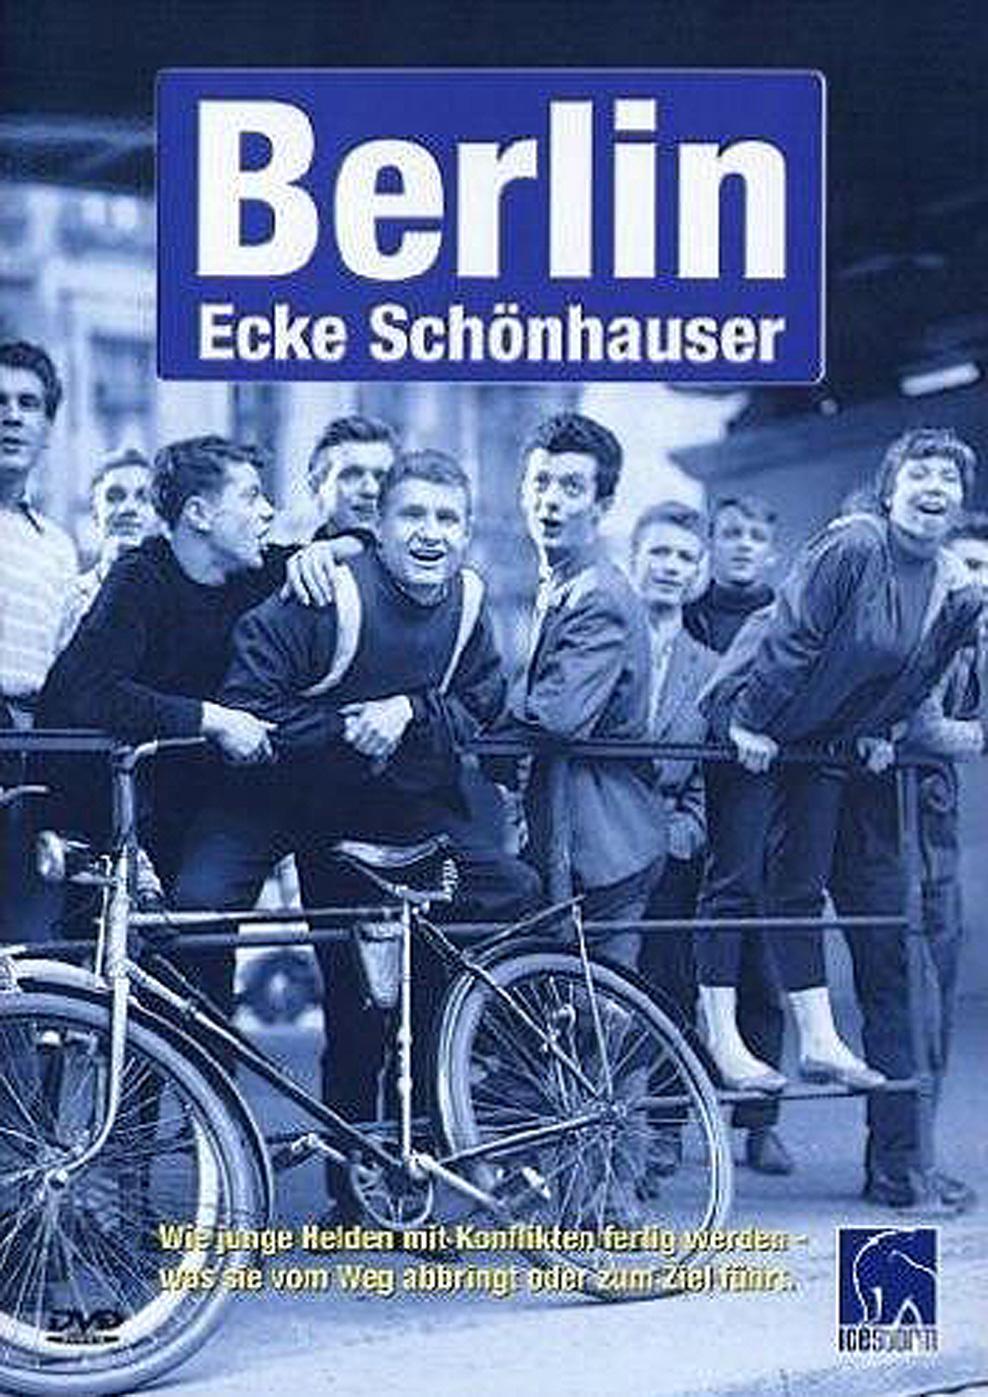 Berlin - Ecke Schönhauser (Poster)